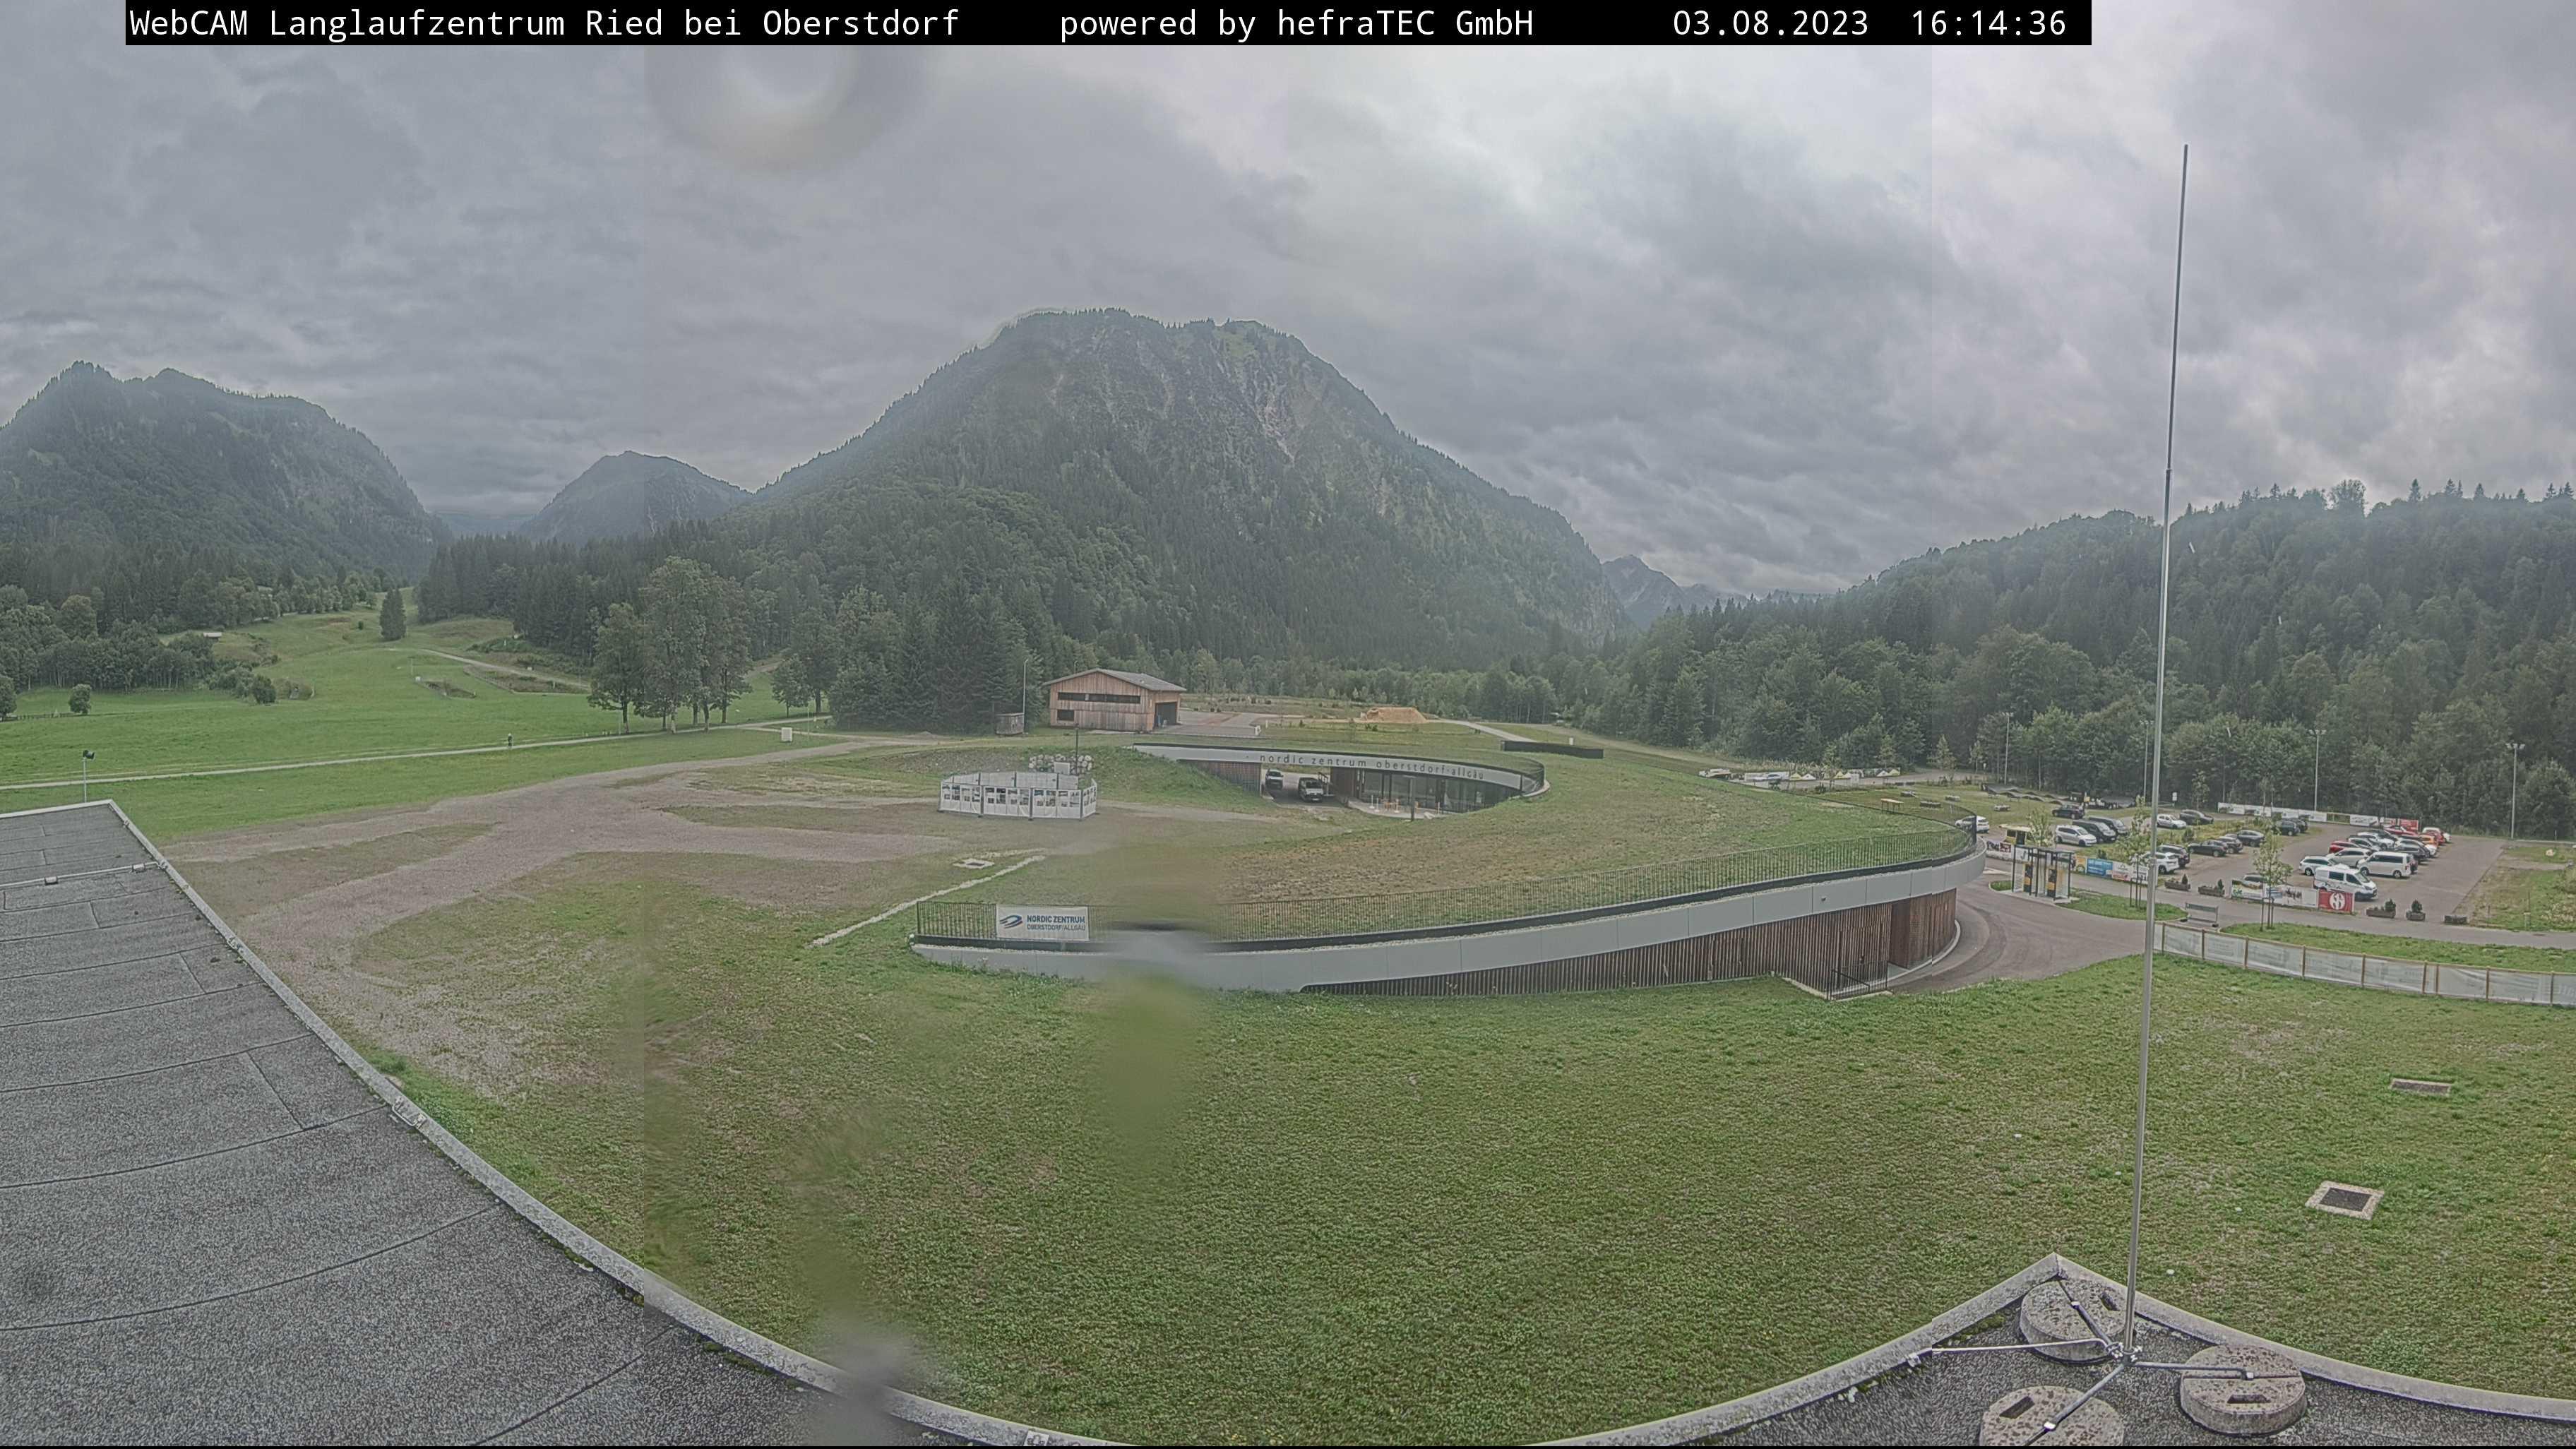 Webcam Langlaufstadion Ried